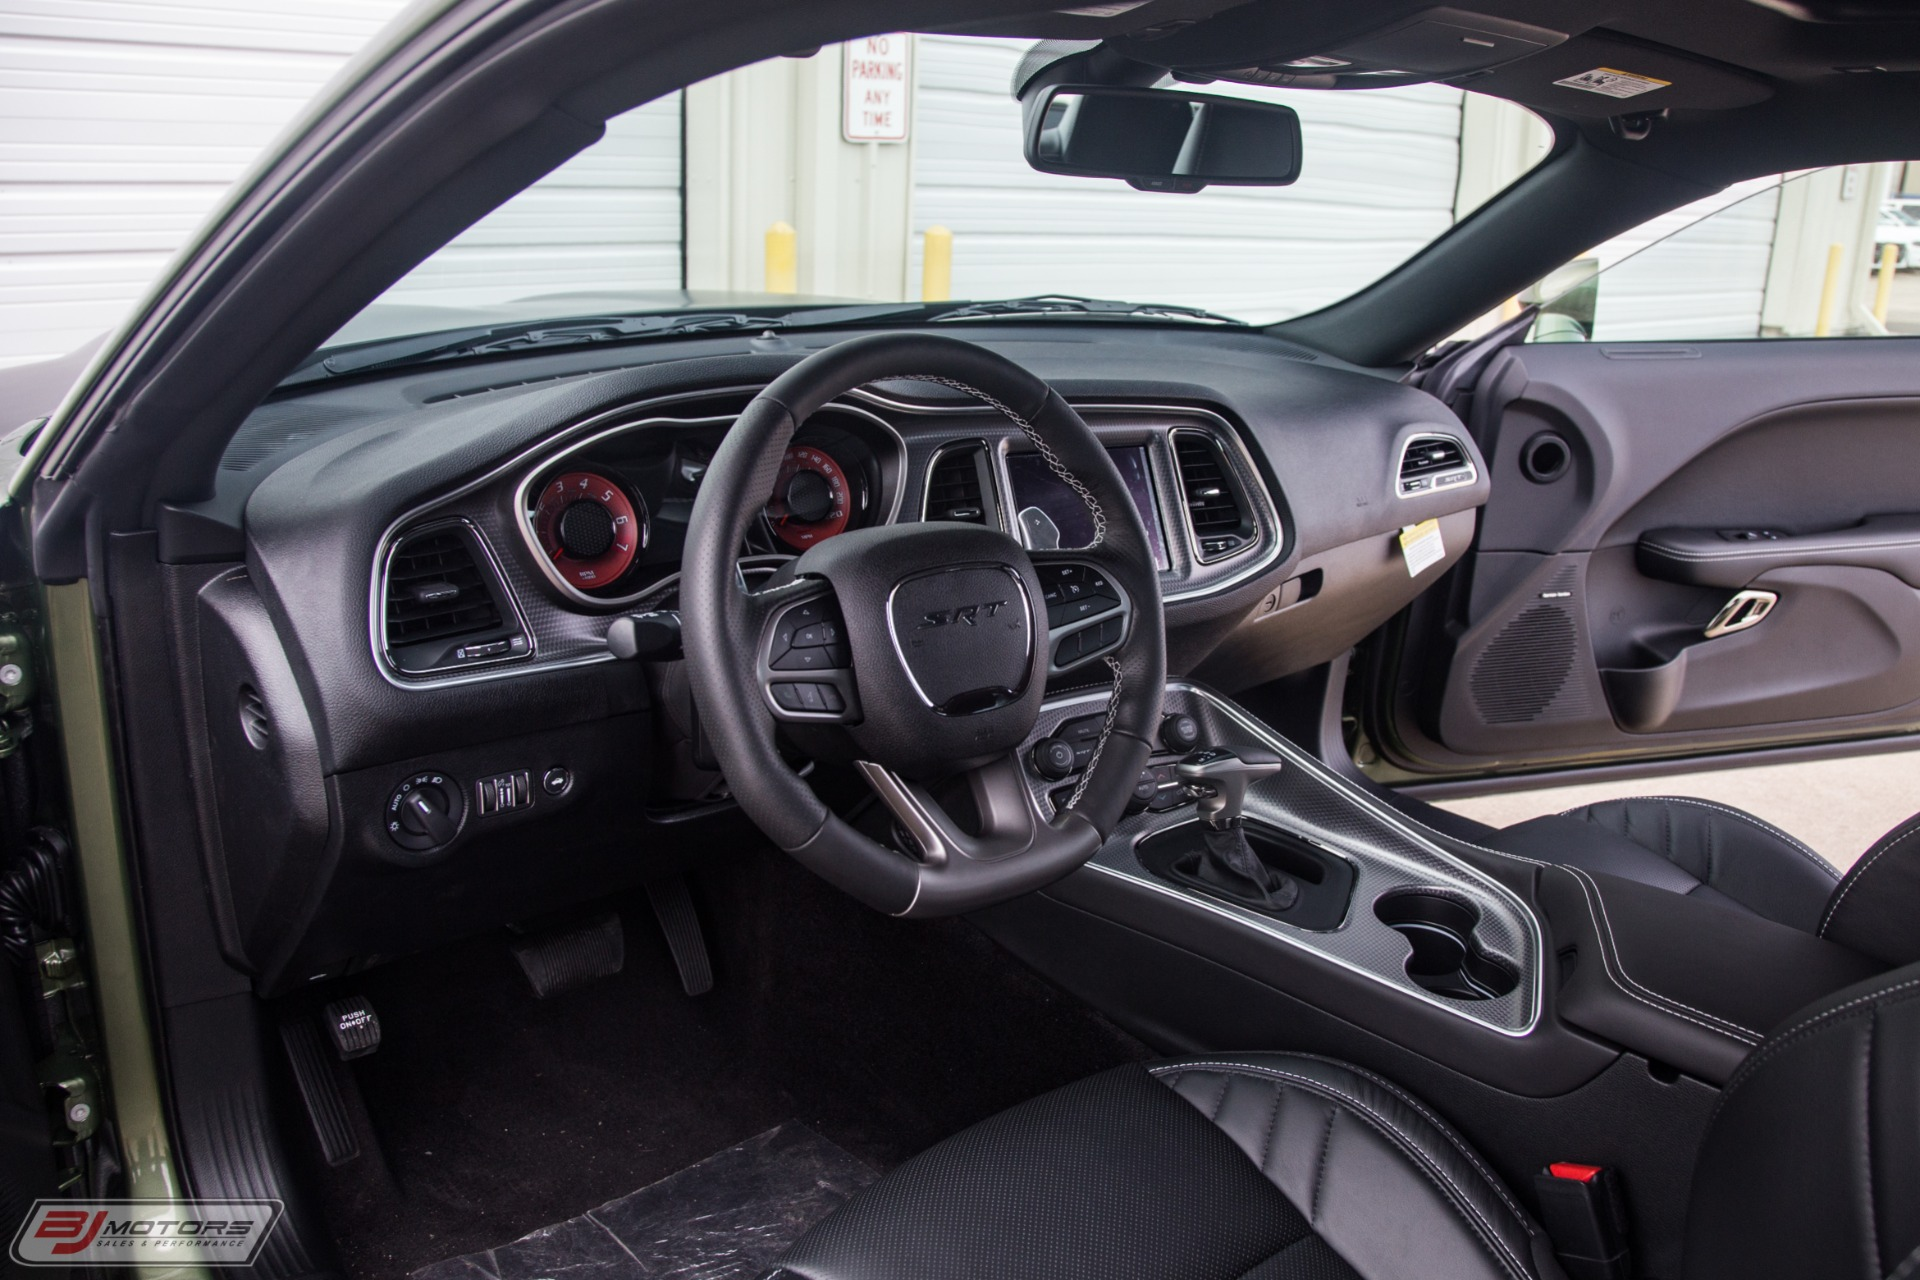 New-2019-Dodge-Challenger-SRT-Hellcat-Redeye